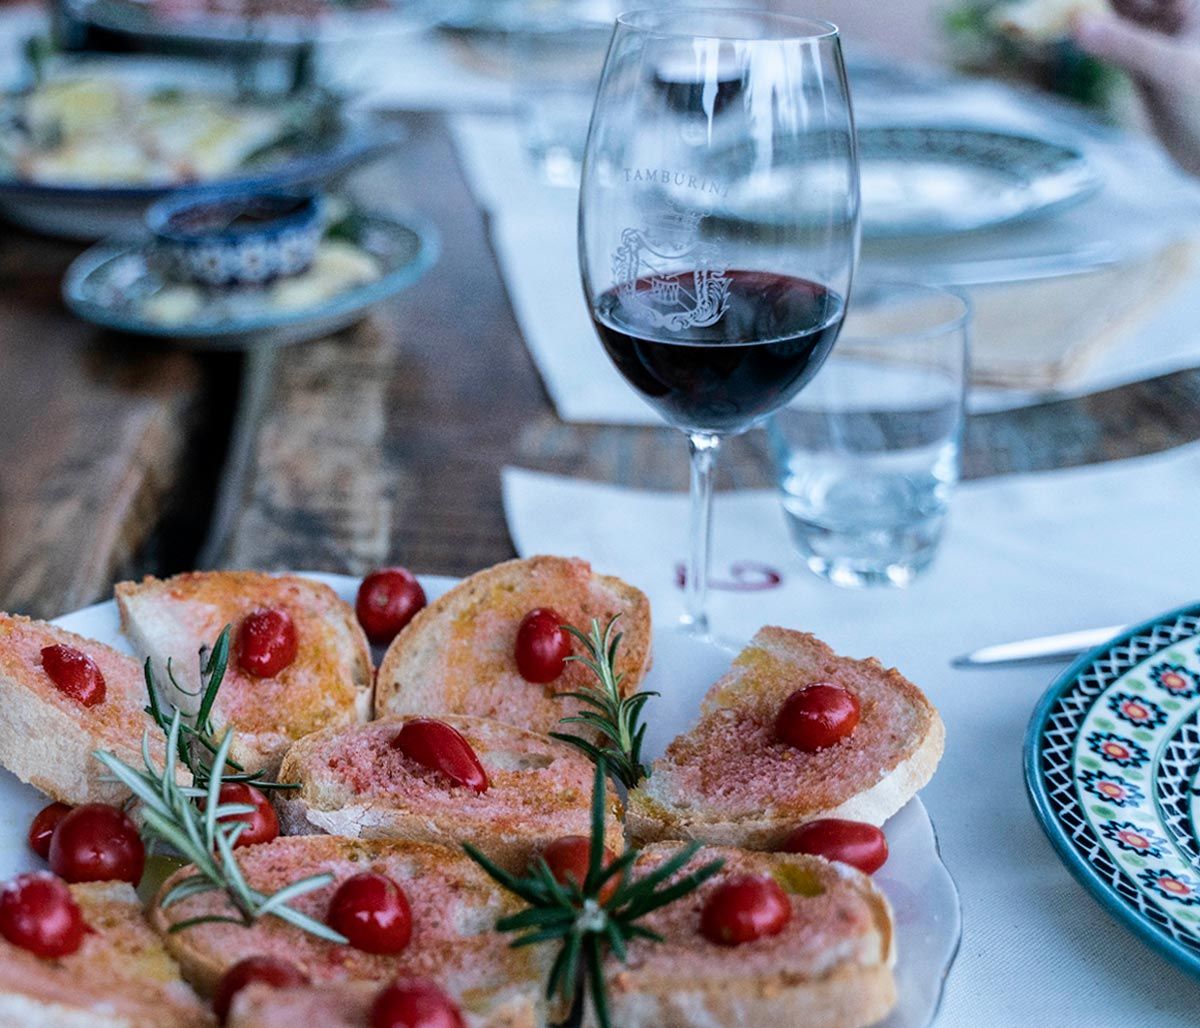 Wine tasting experience in Agricola Tamburini